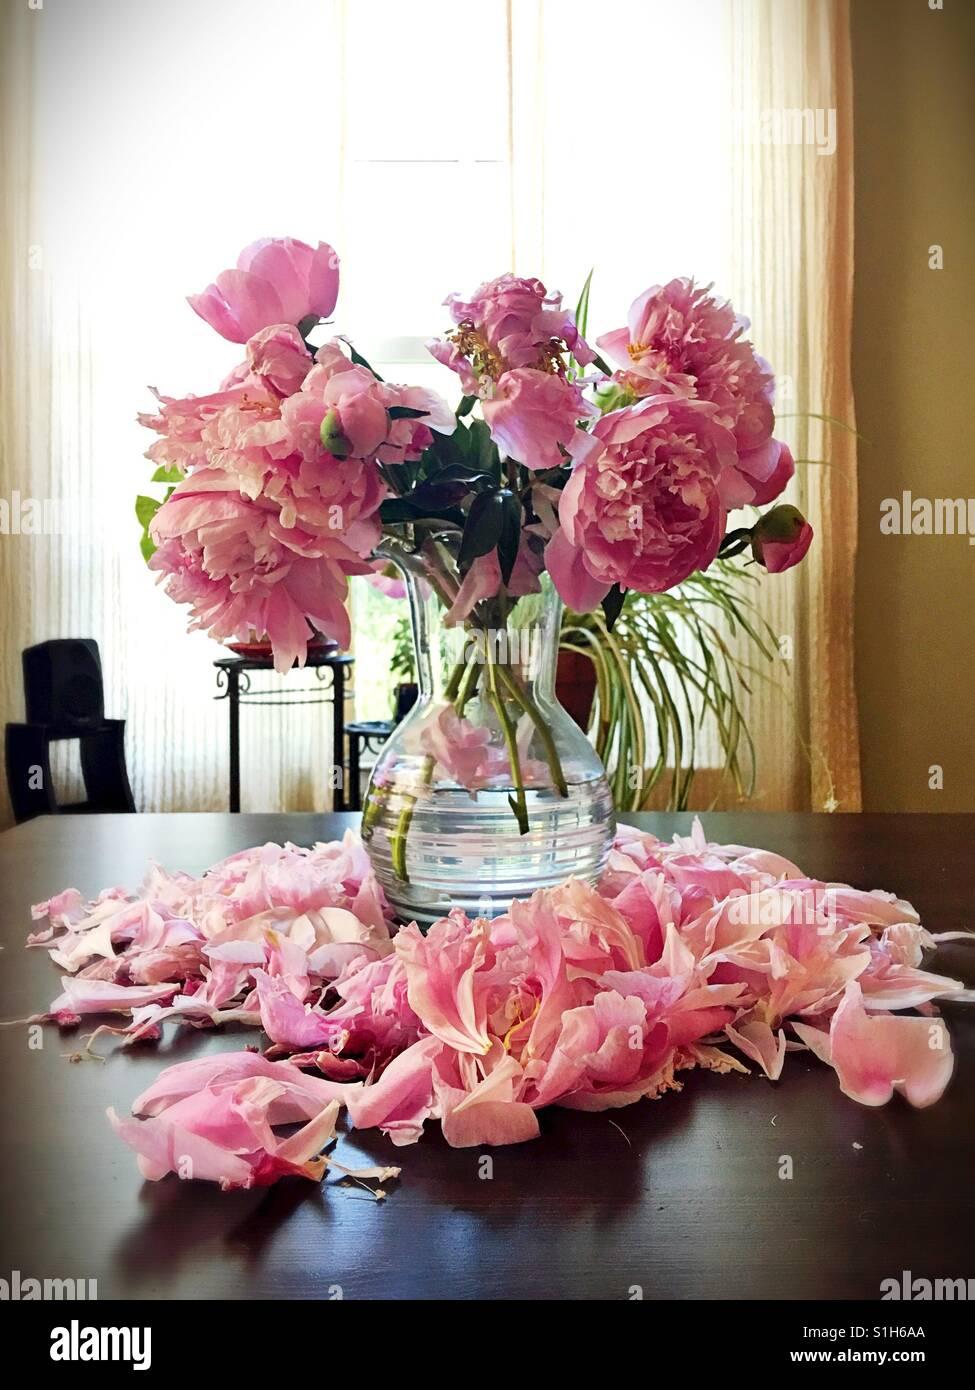 Flowers Dying Stockfotos & Flowers Dying Bilder - Alamy